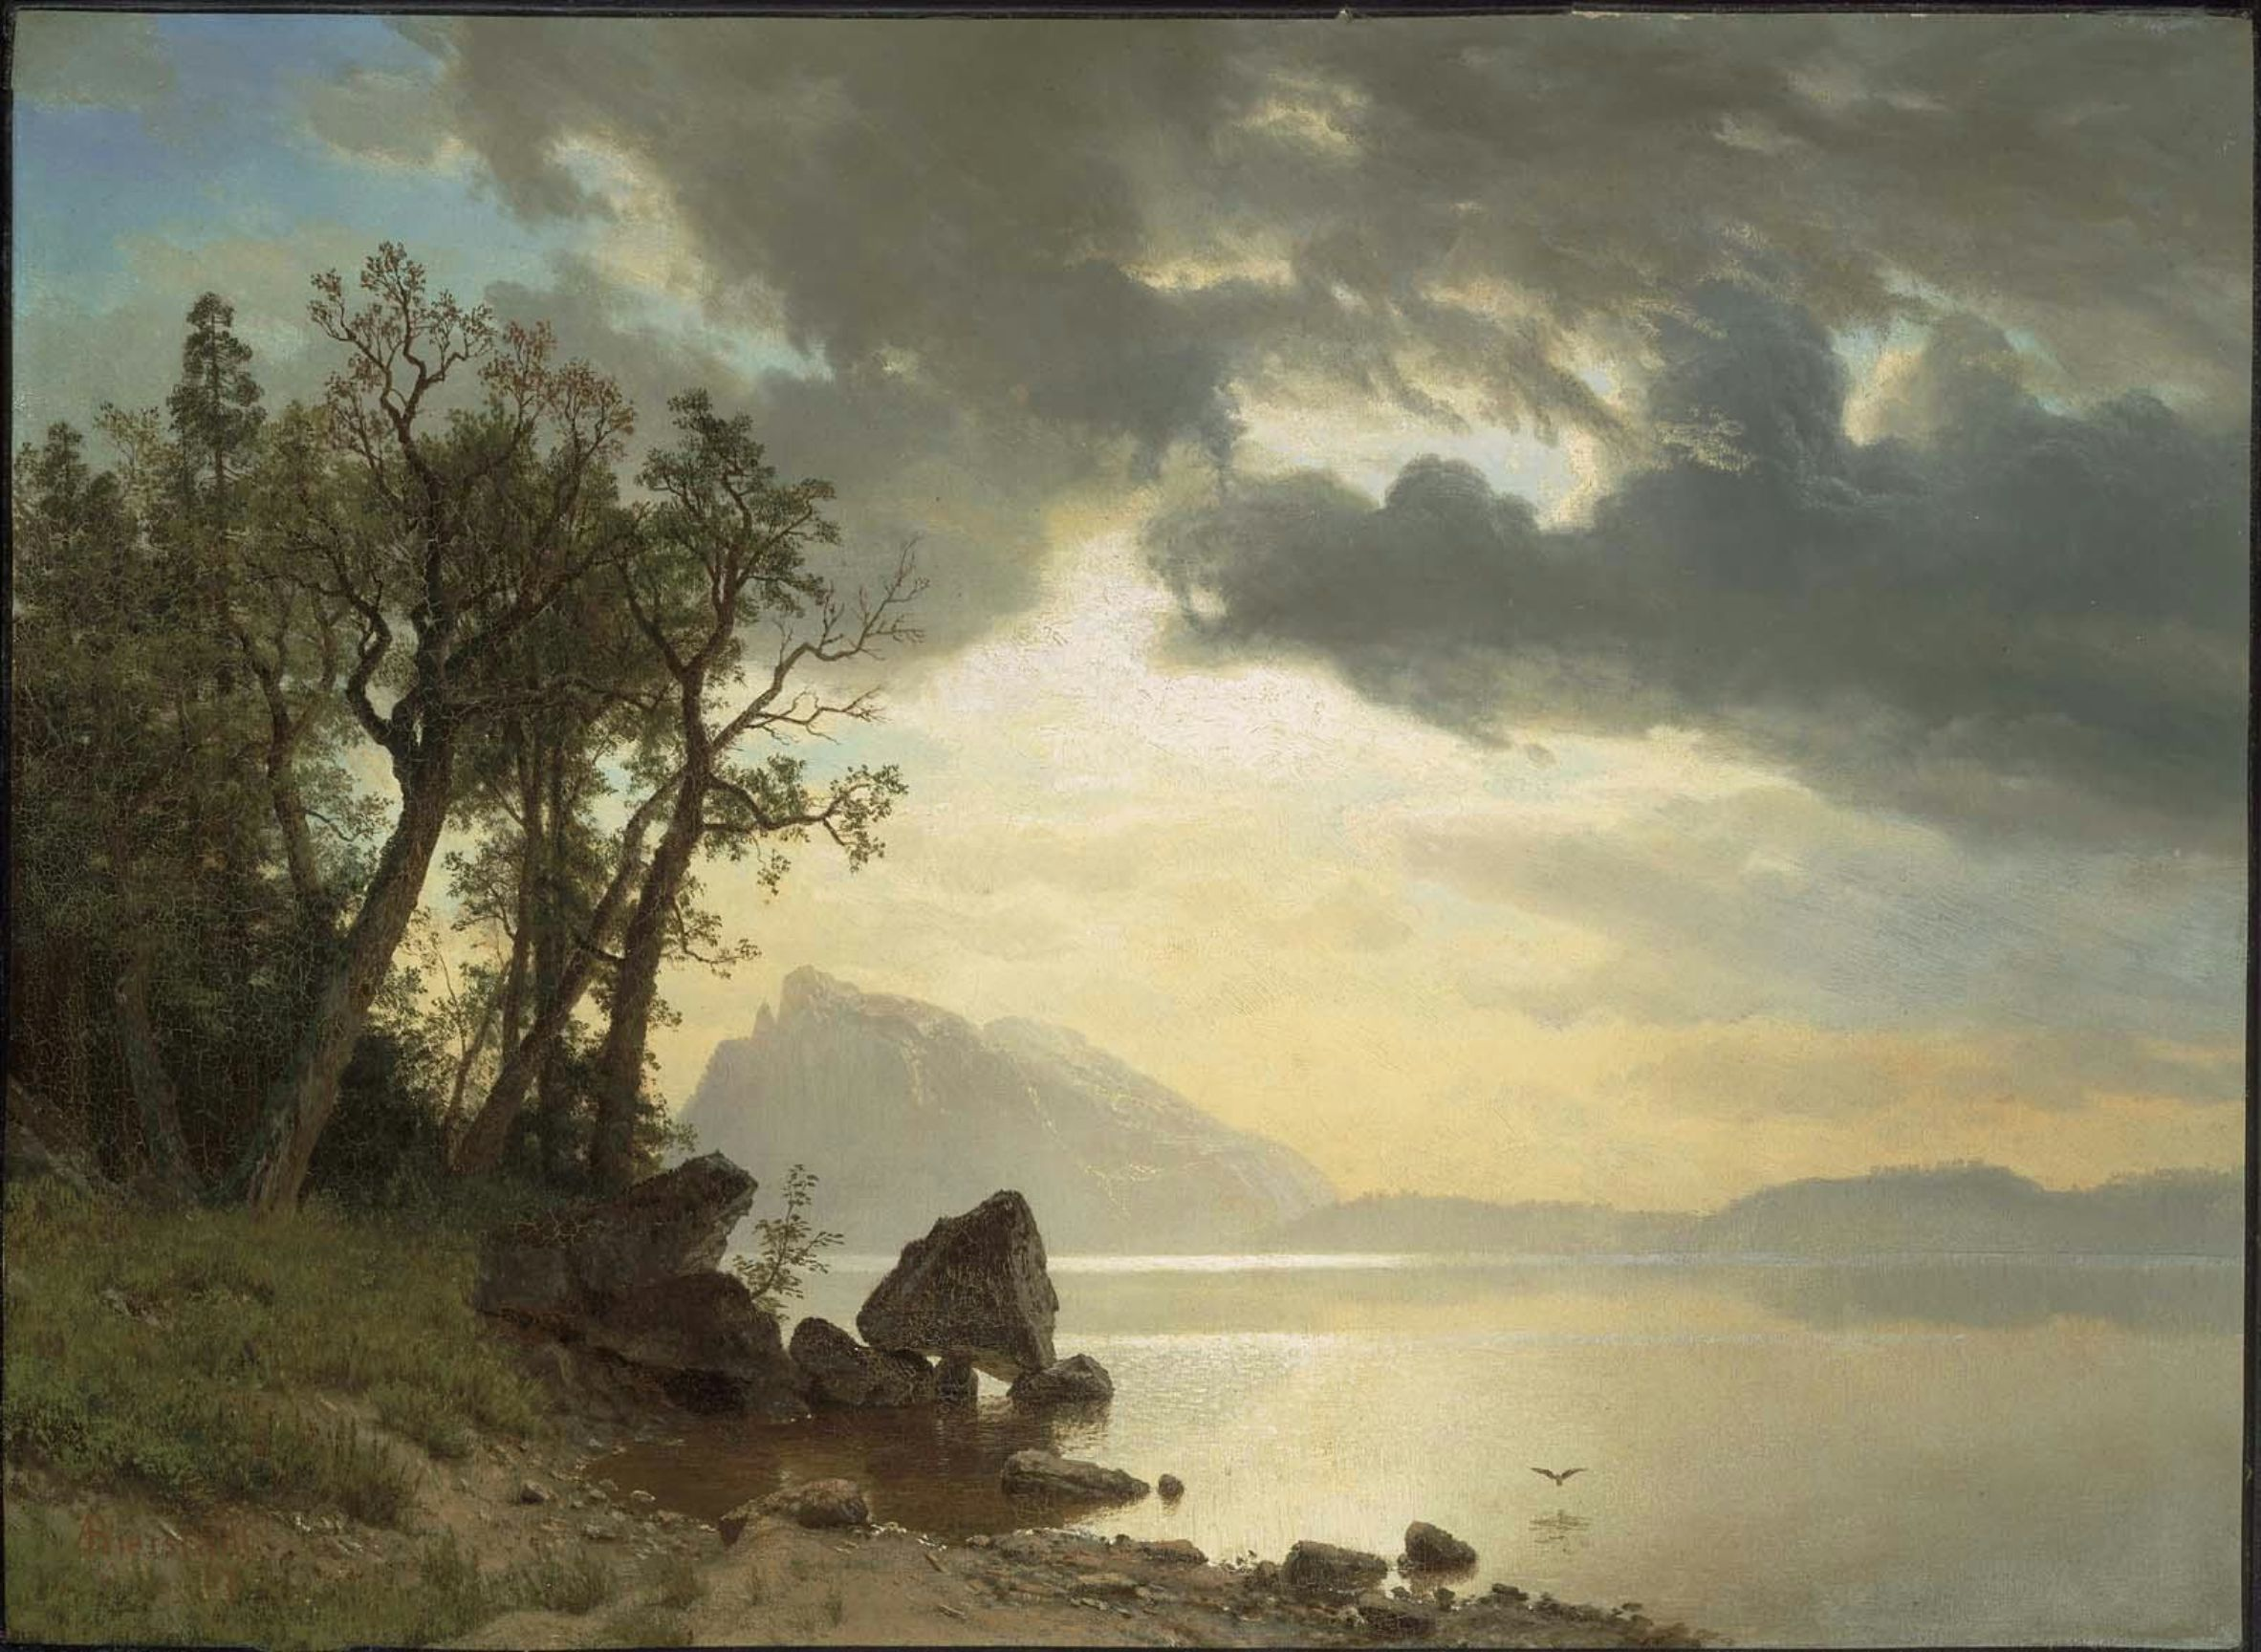 Albert_Bierstadt_-_Lake_Tahoe,_California